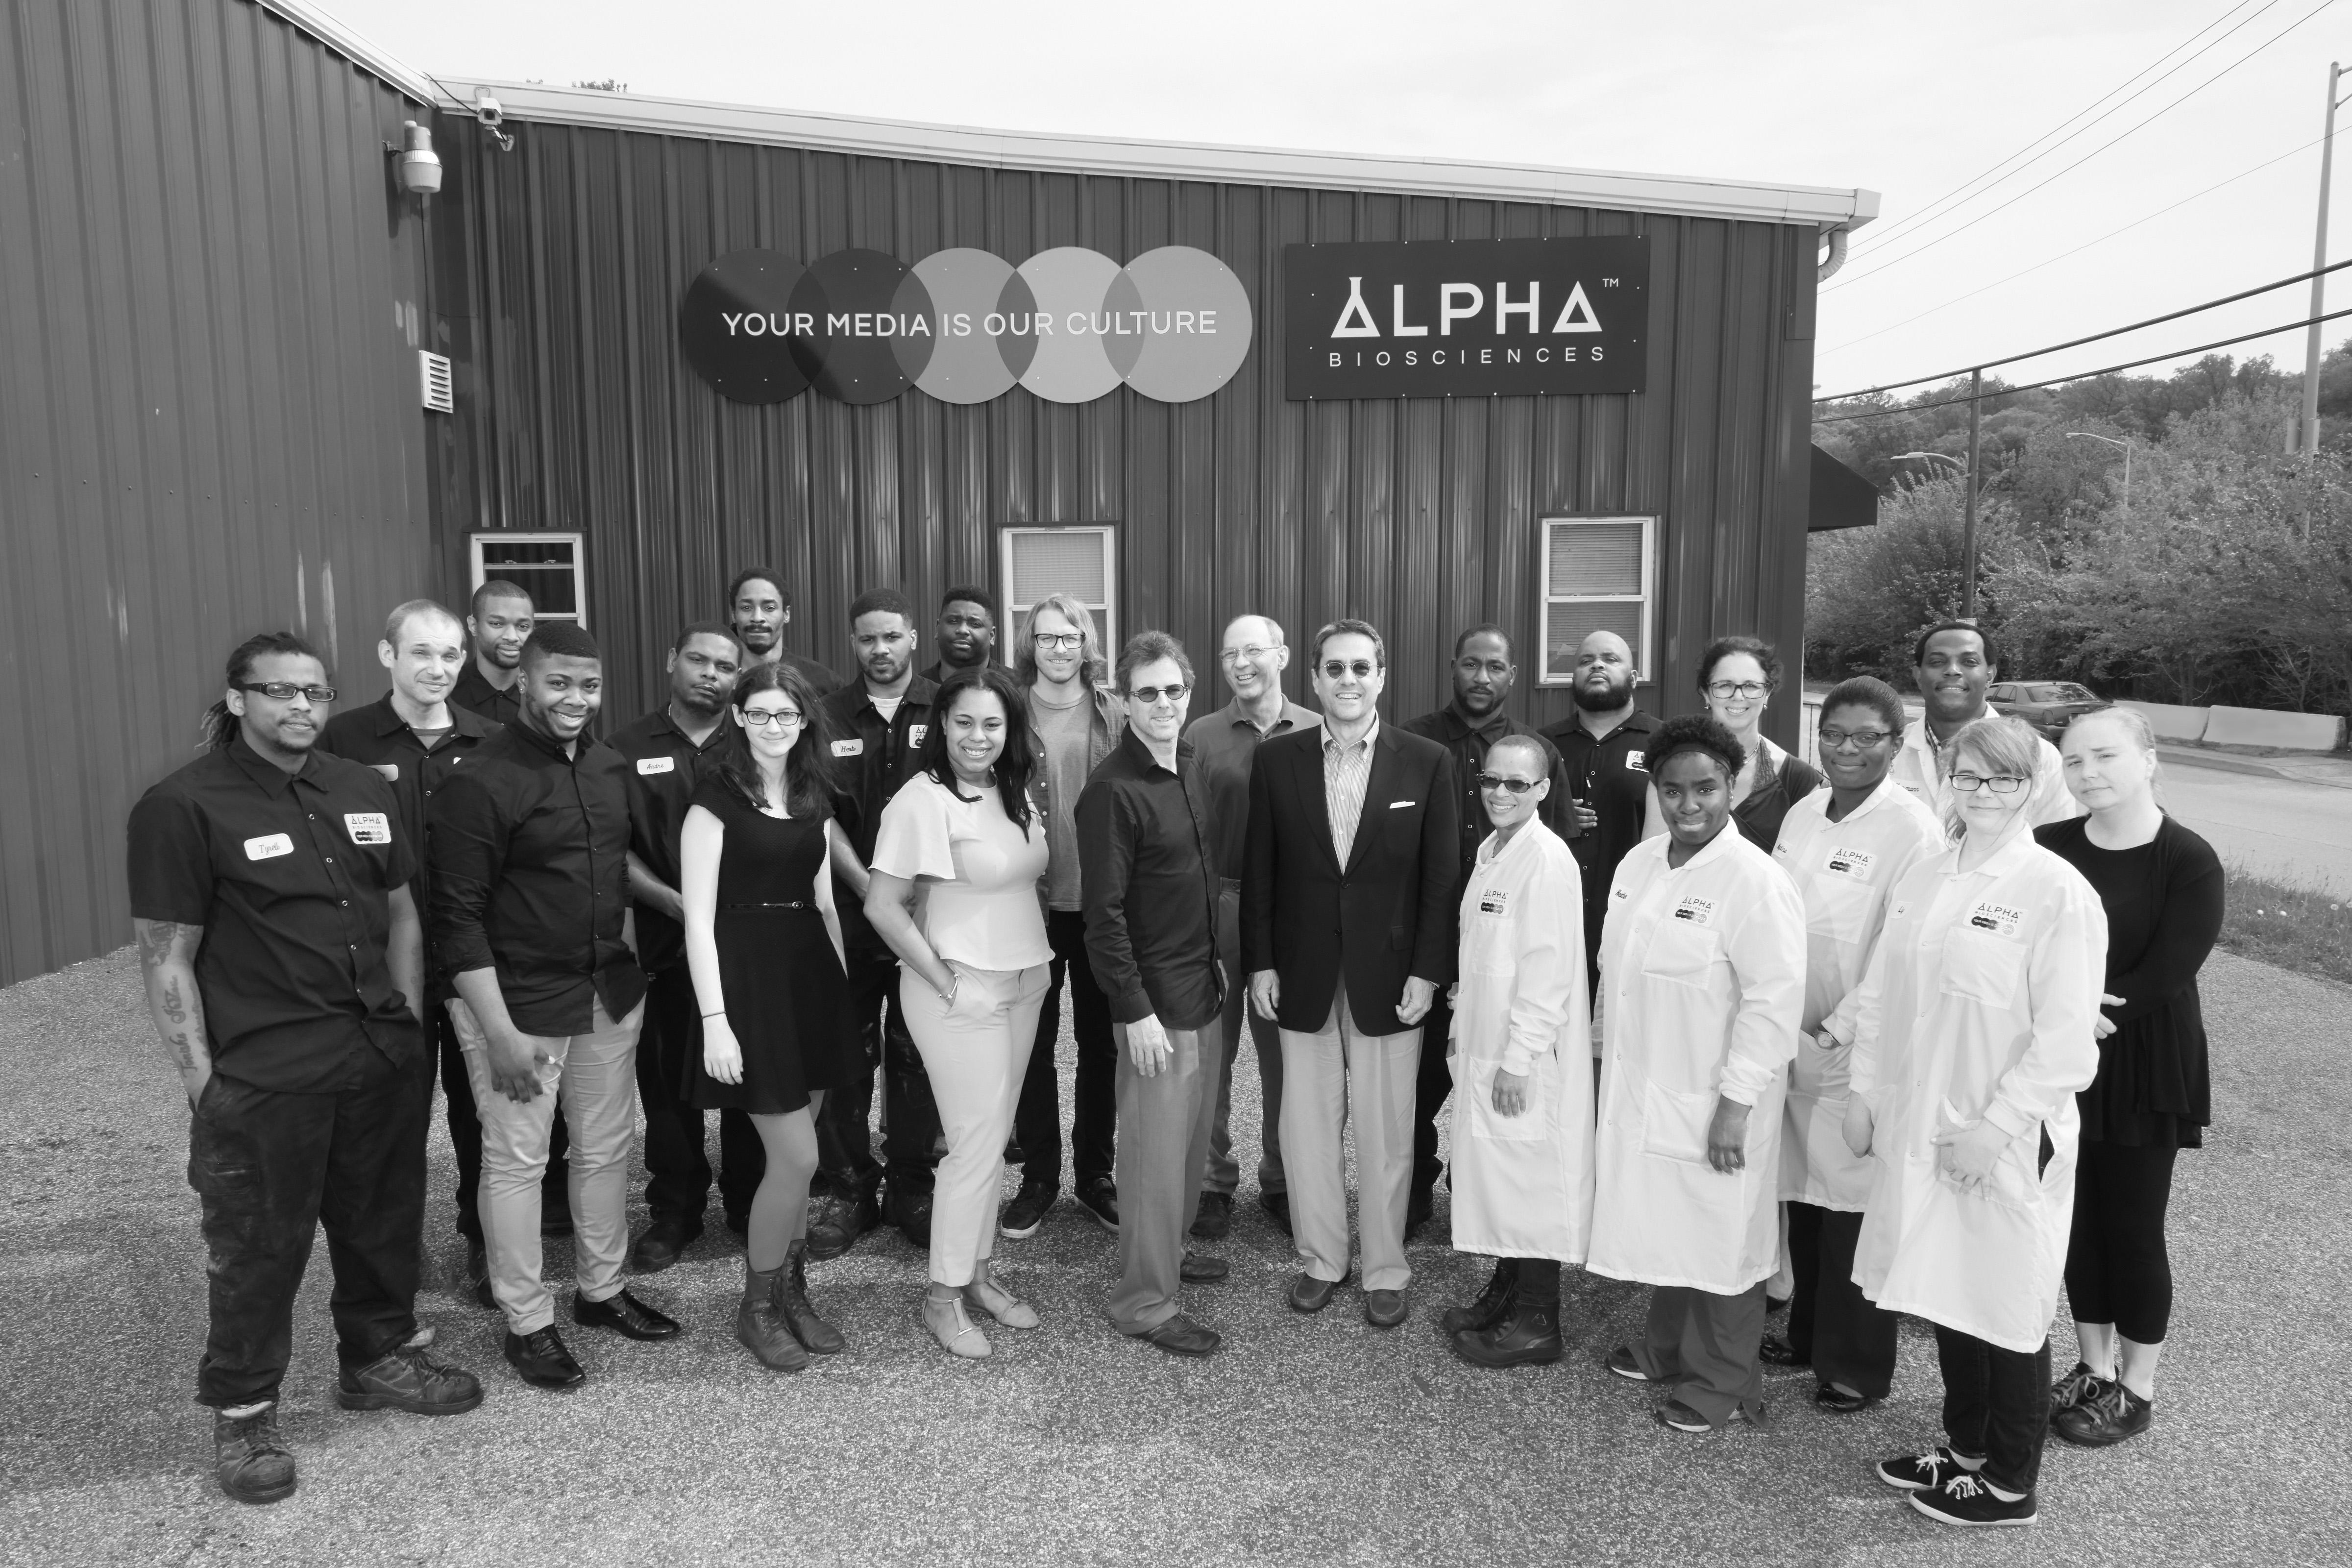 Alpha Biosciences Employees